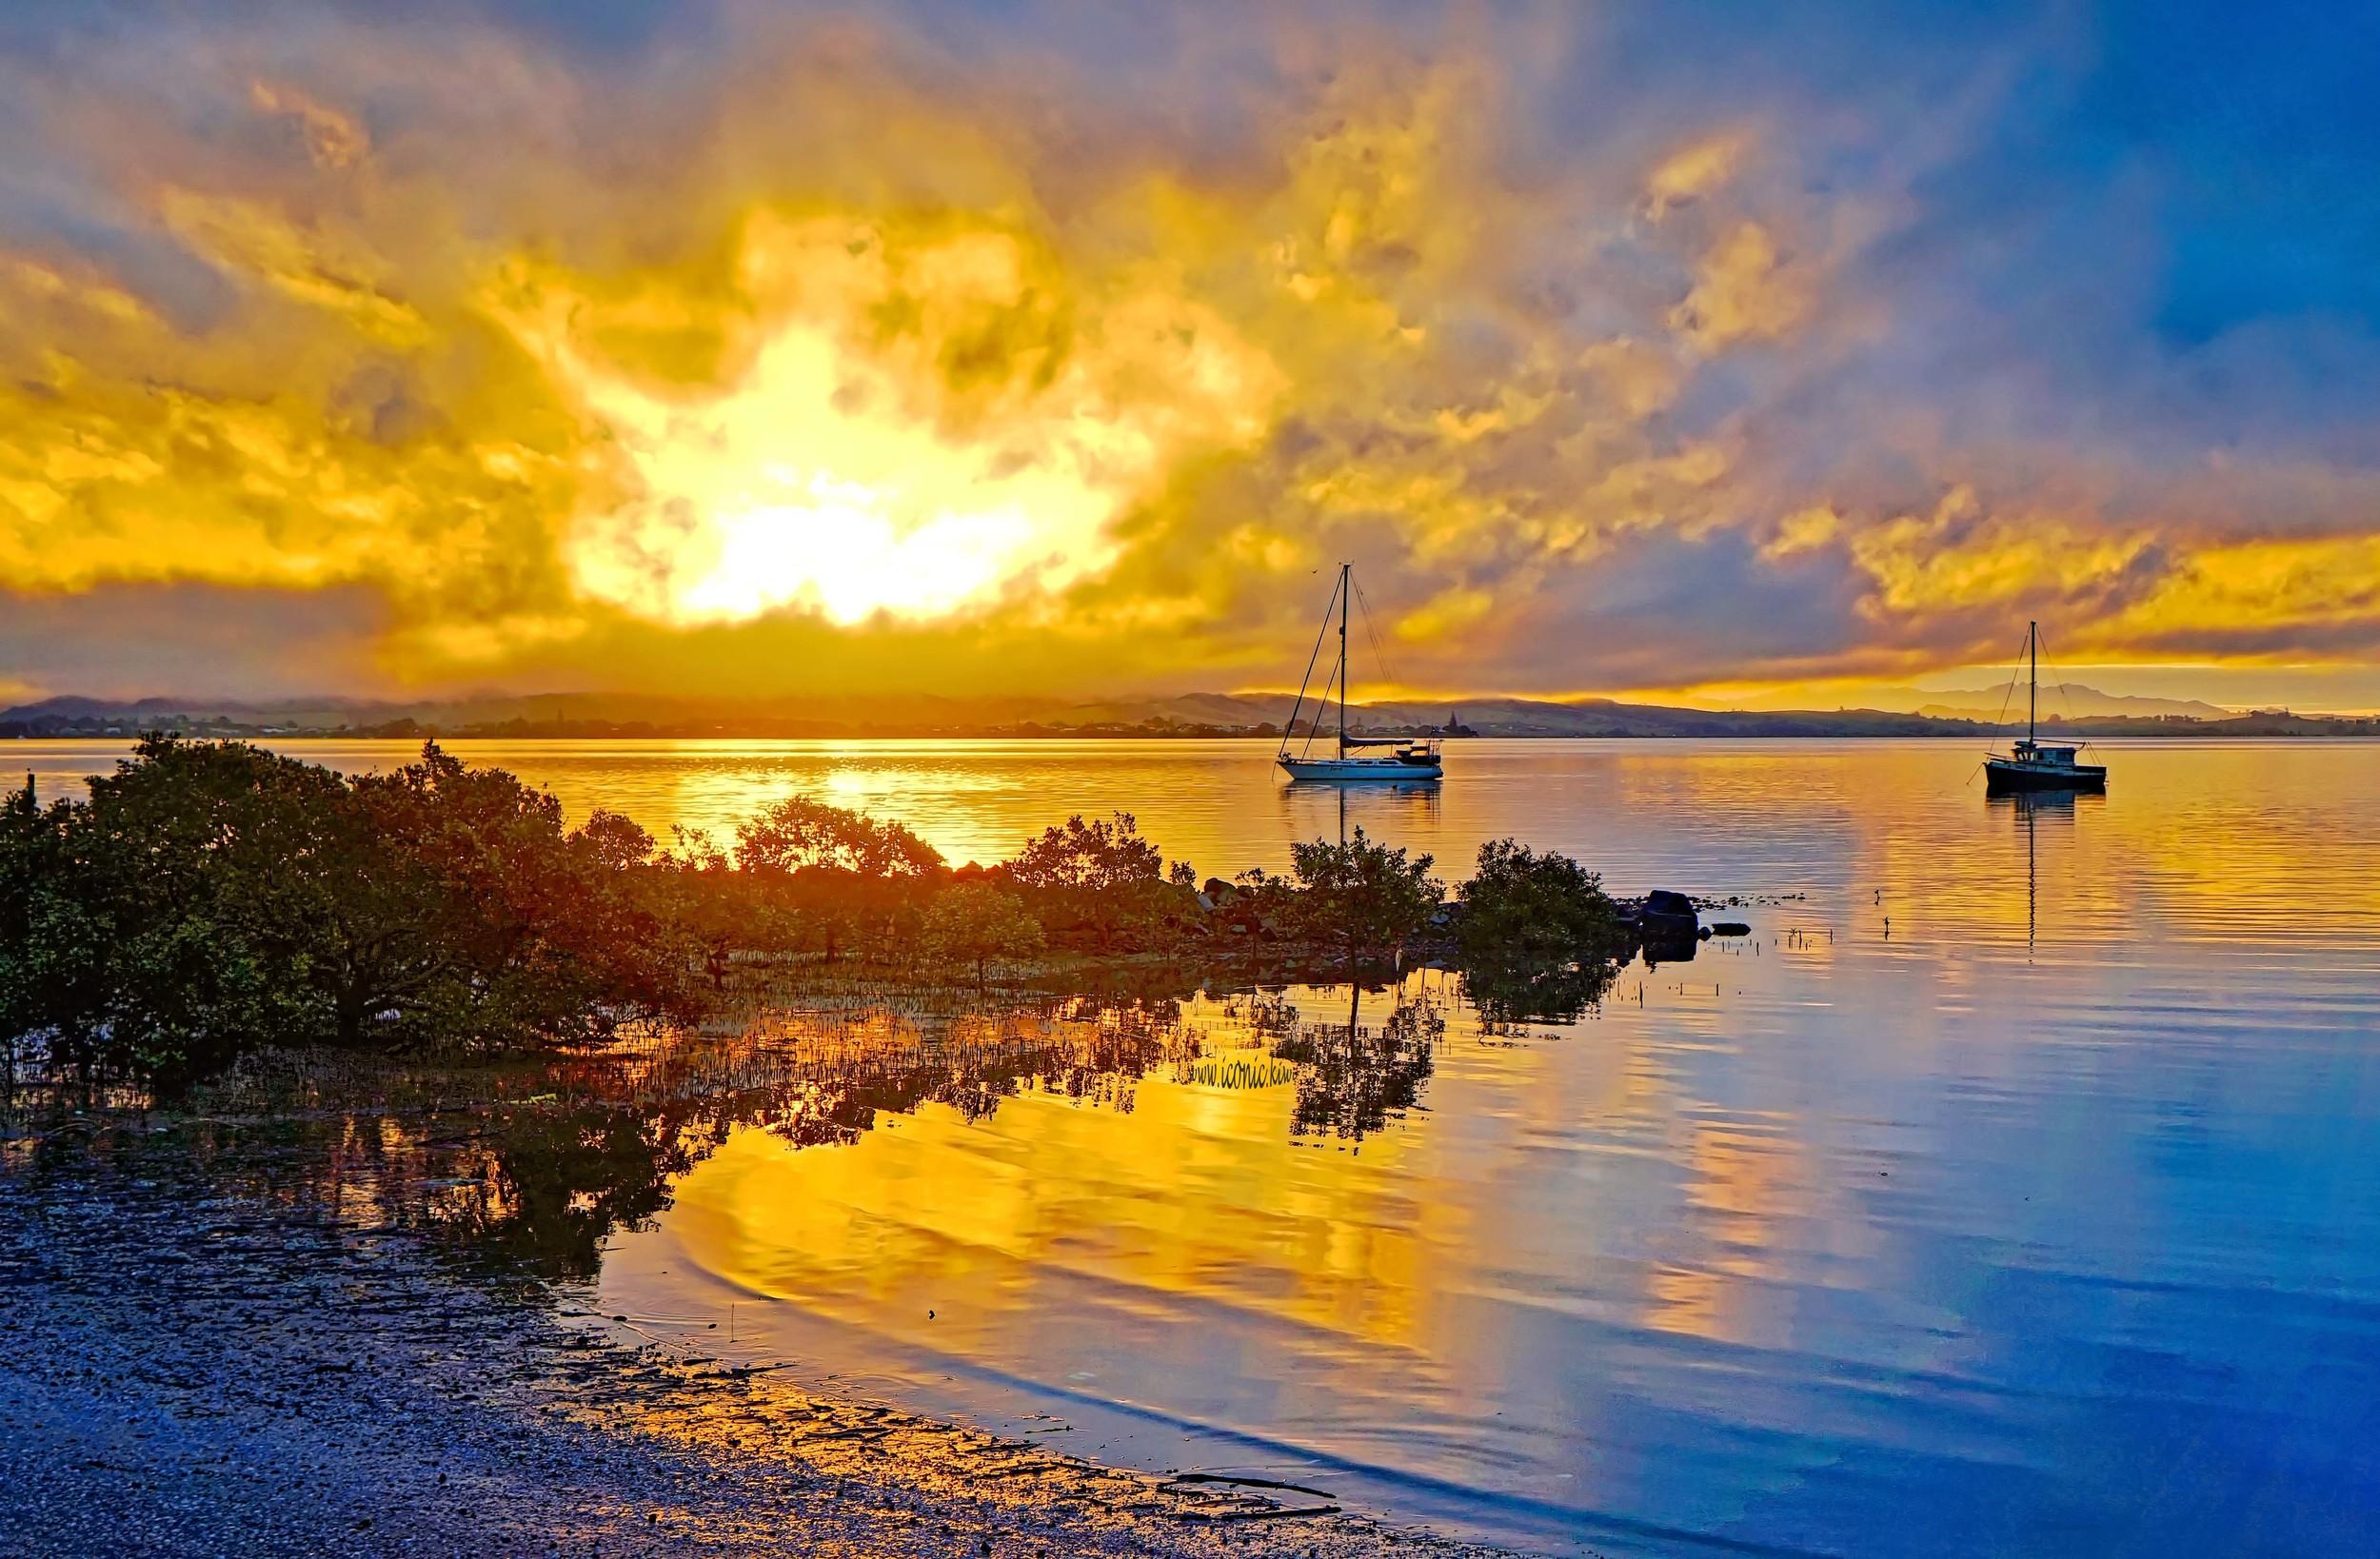 Mangroves reflected at sunset, Northland, New Zealand